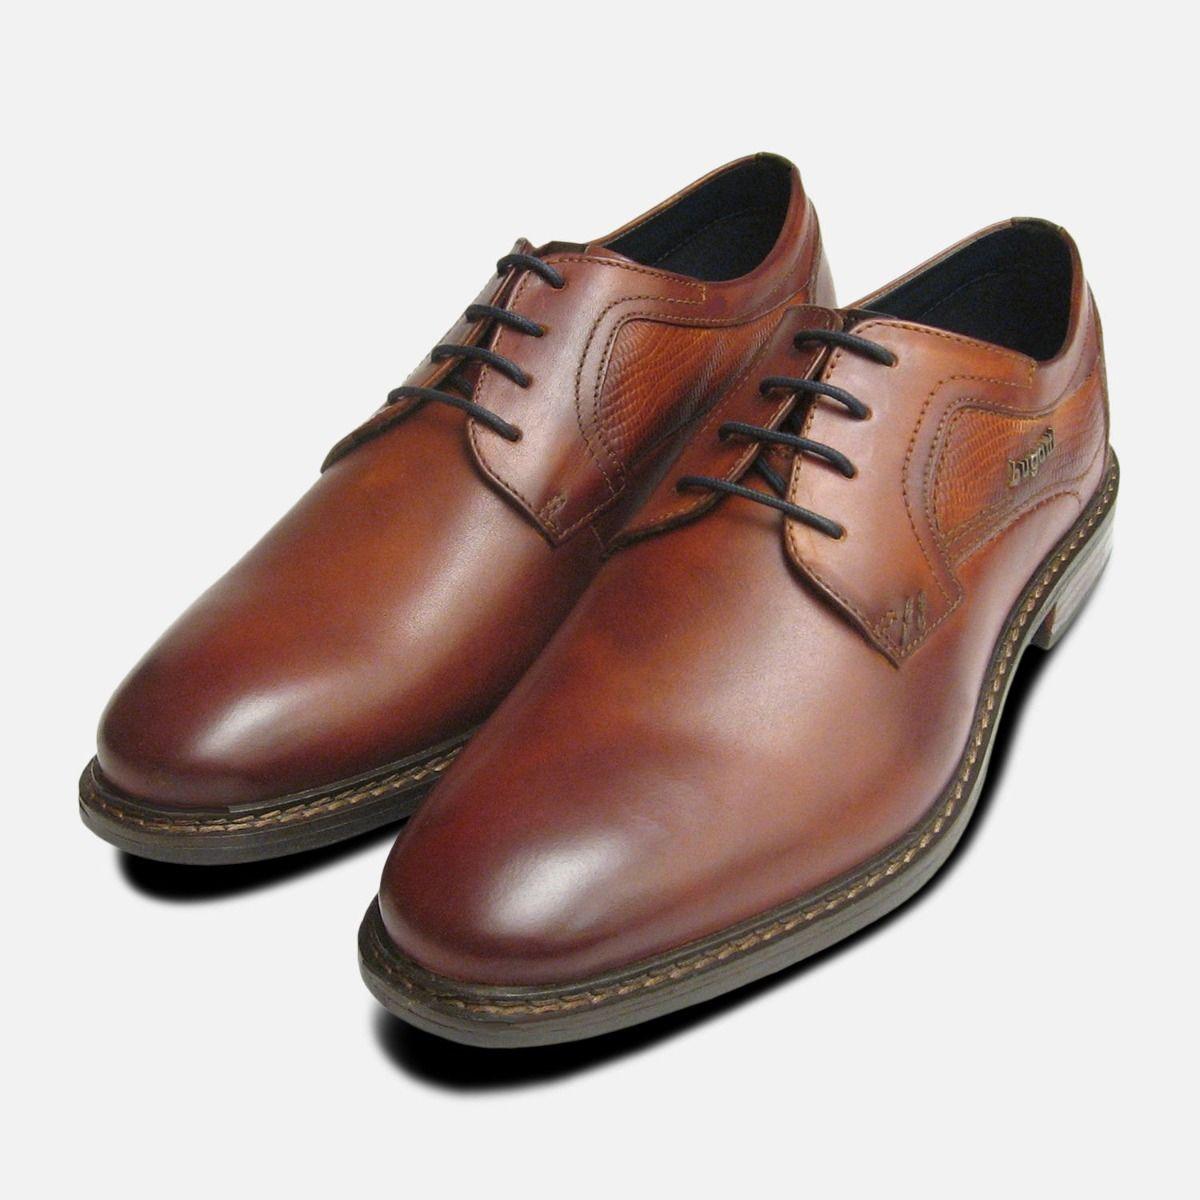 Brown Smart Lace Up Shoes Bugatti Men